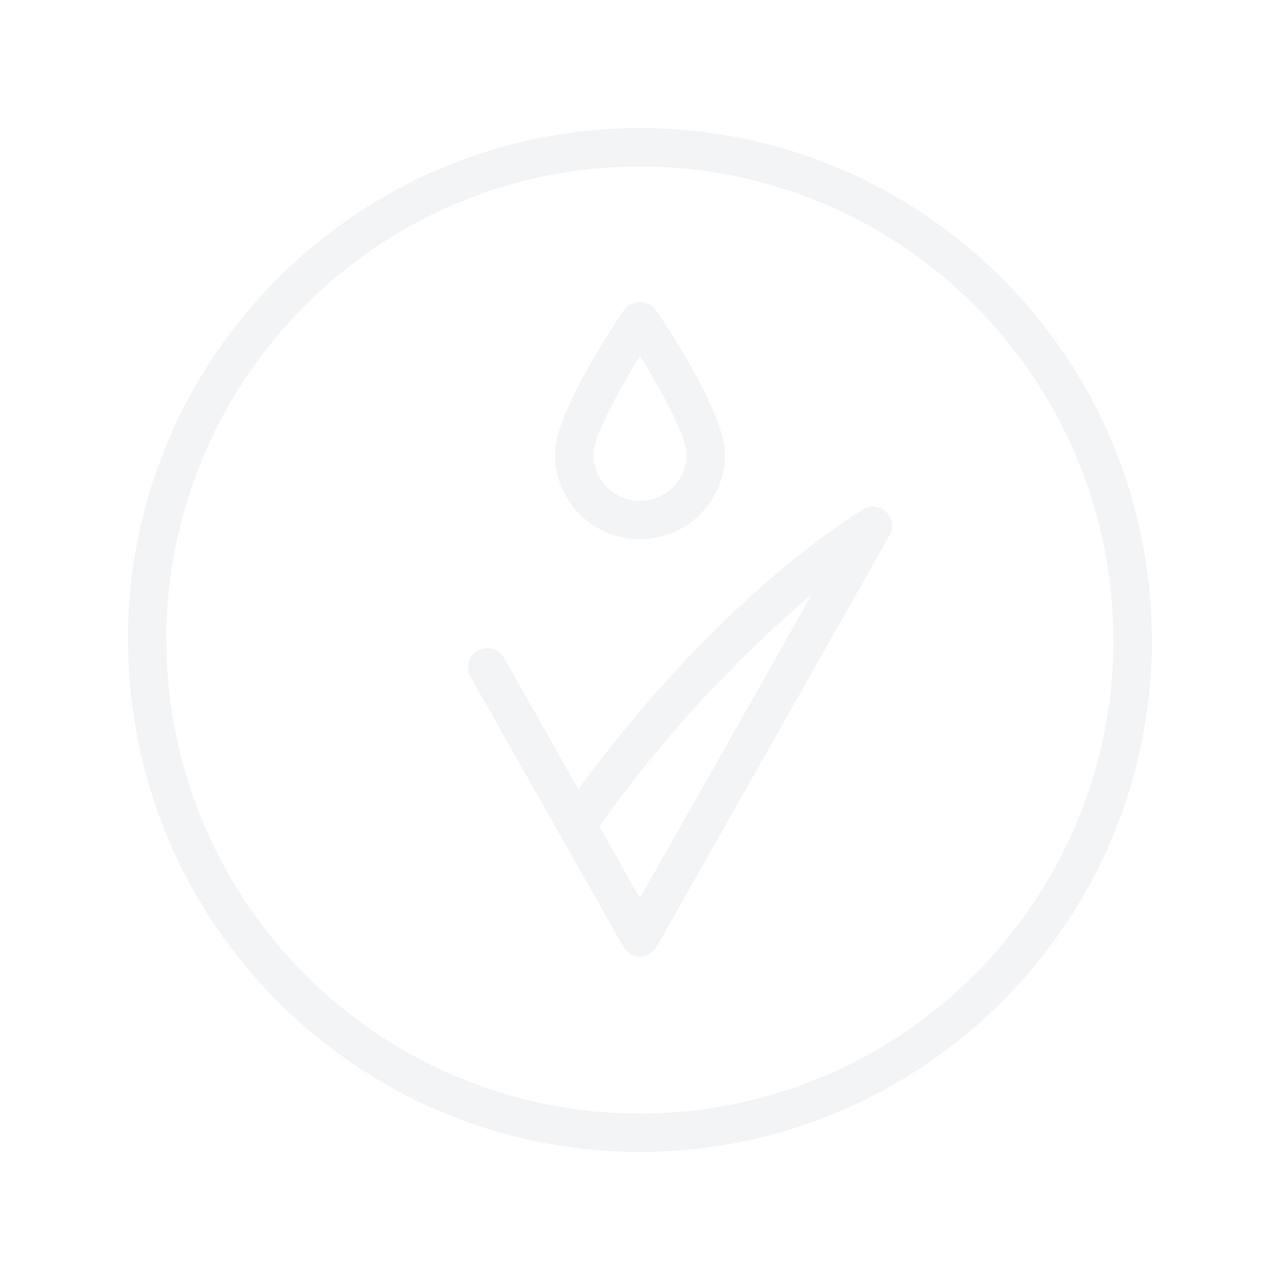 LA ROCHE-POSAY Effaclar Duo + Unifiant 40ml